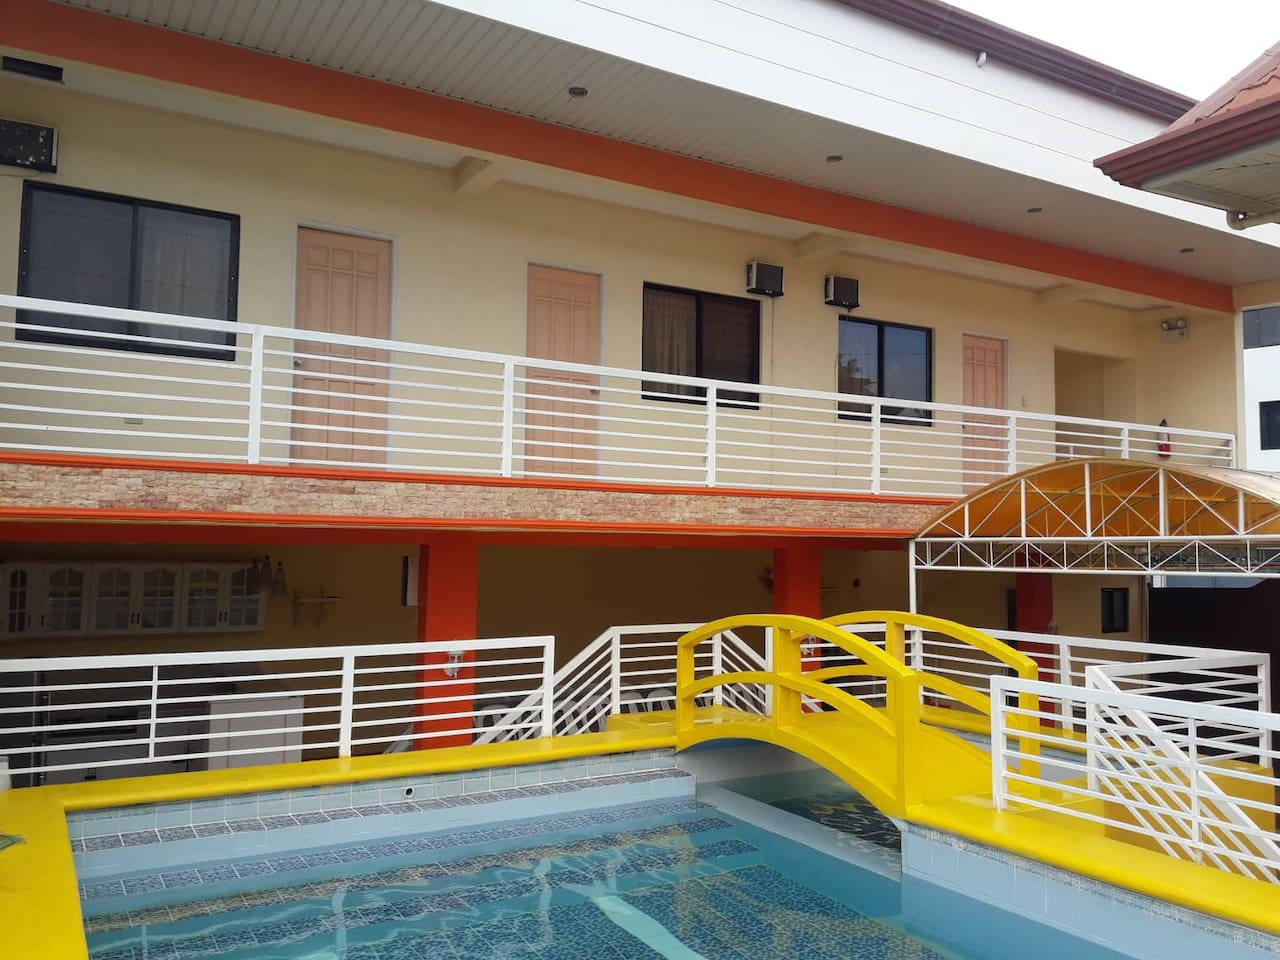 BGV Resorts: M-1 Facility